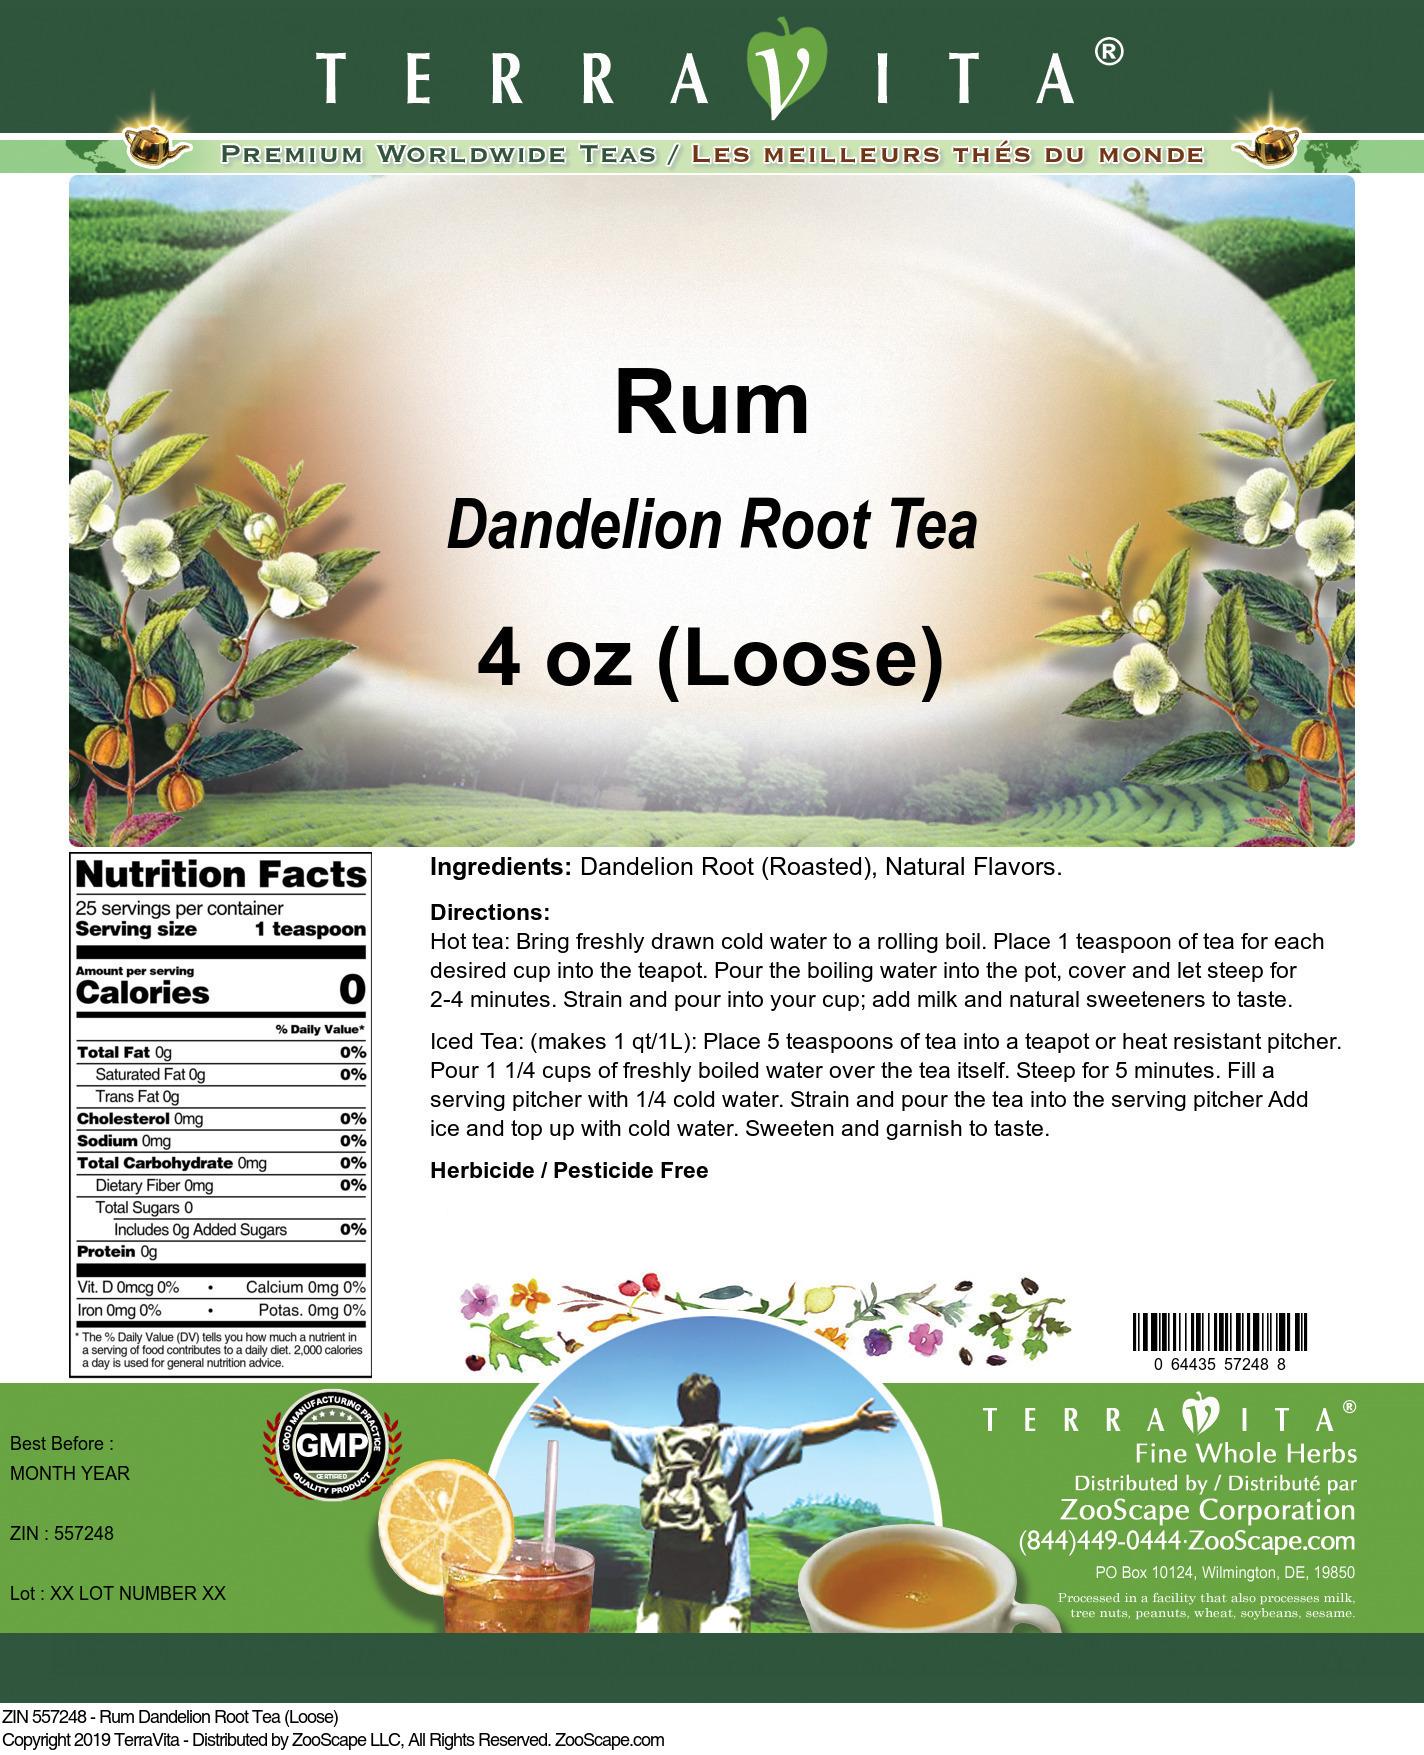 Rum Dandelion Root Tea (Loose)